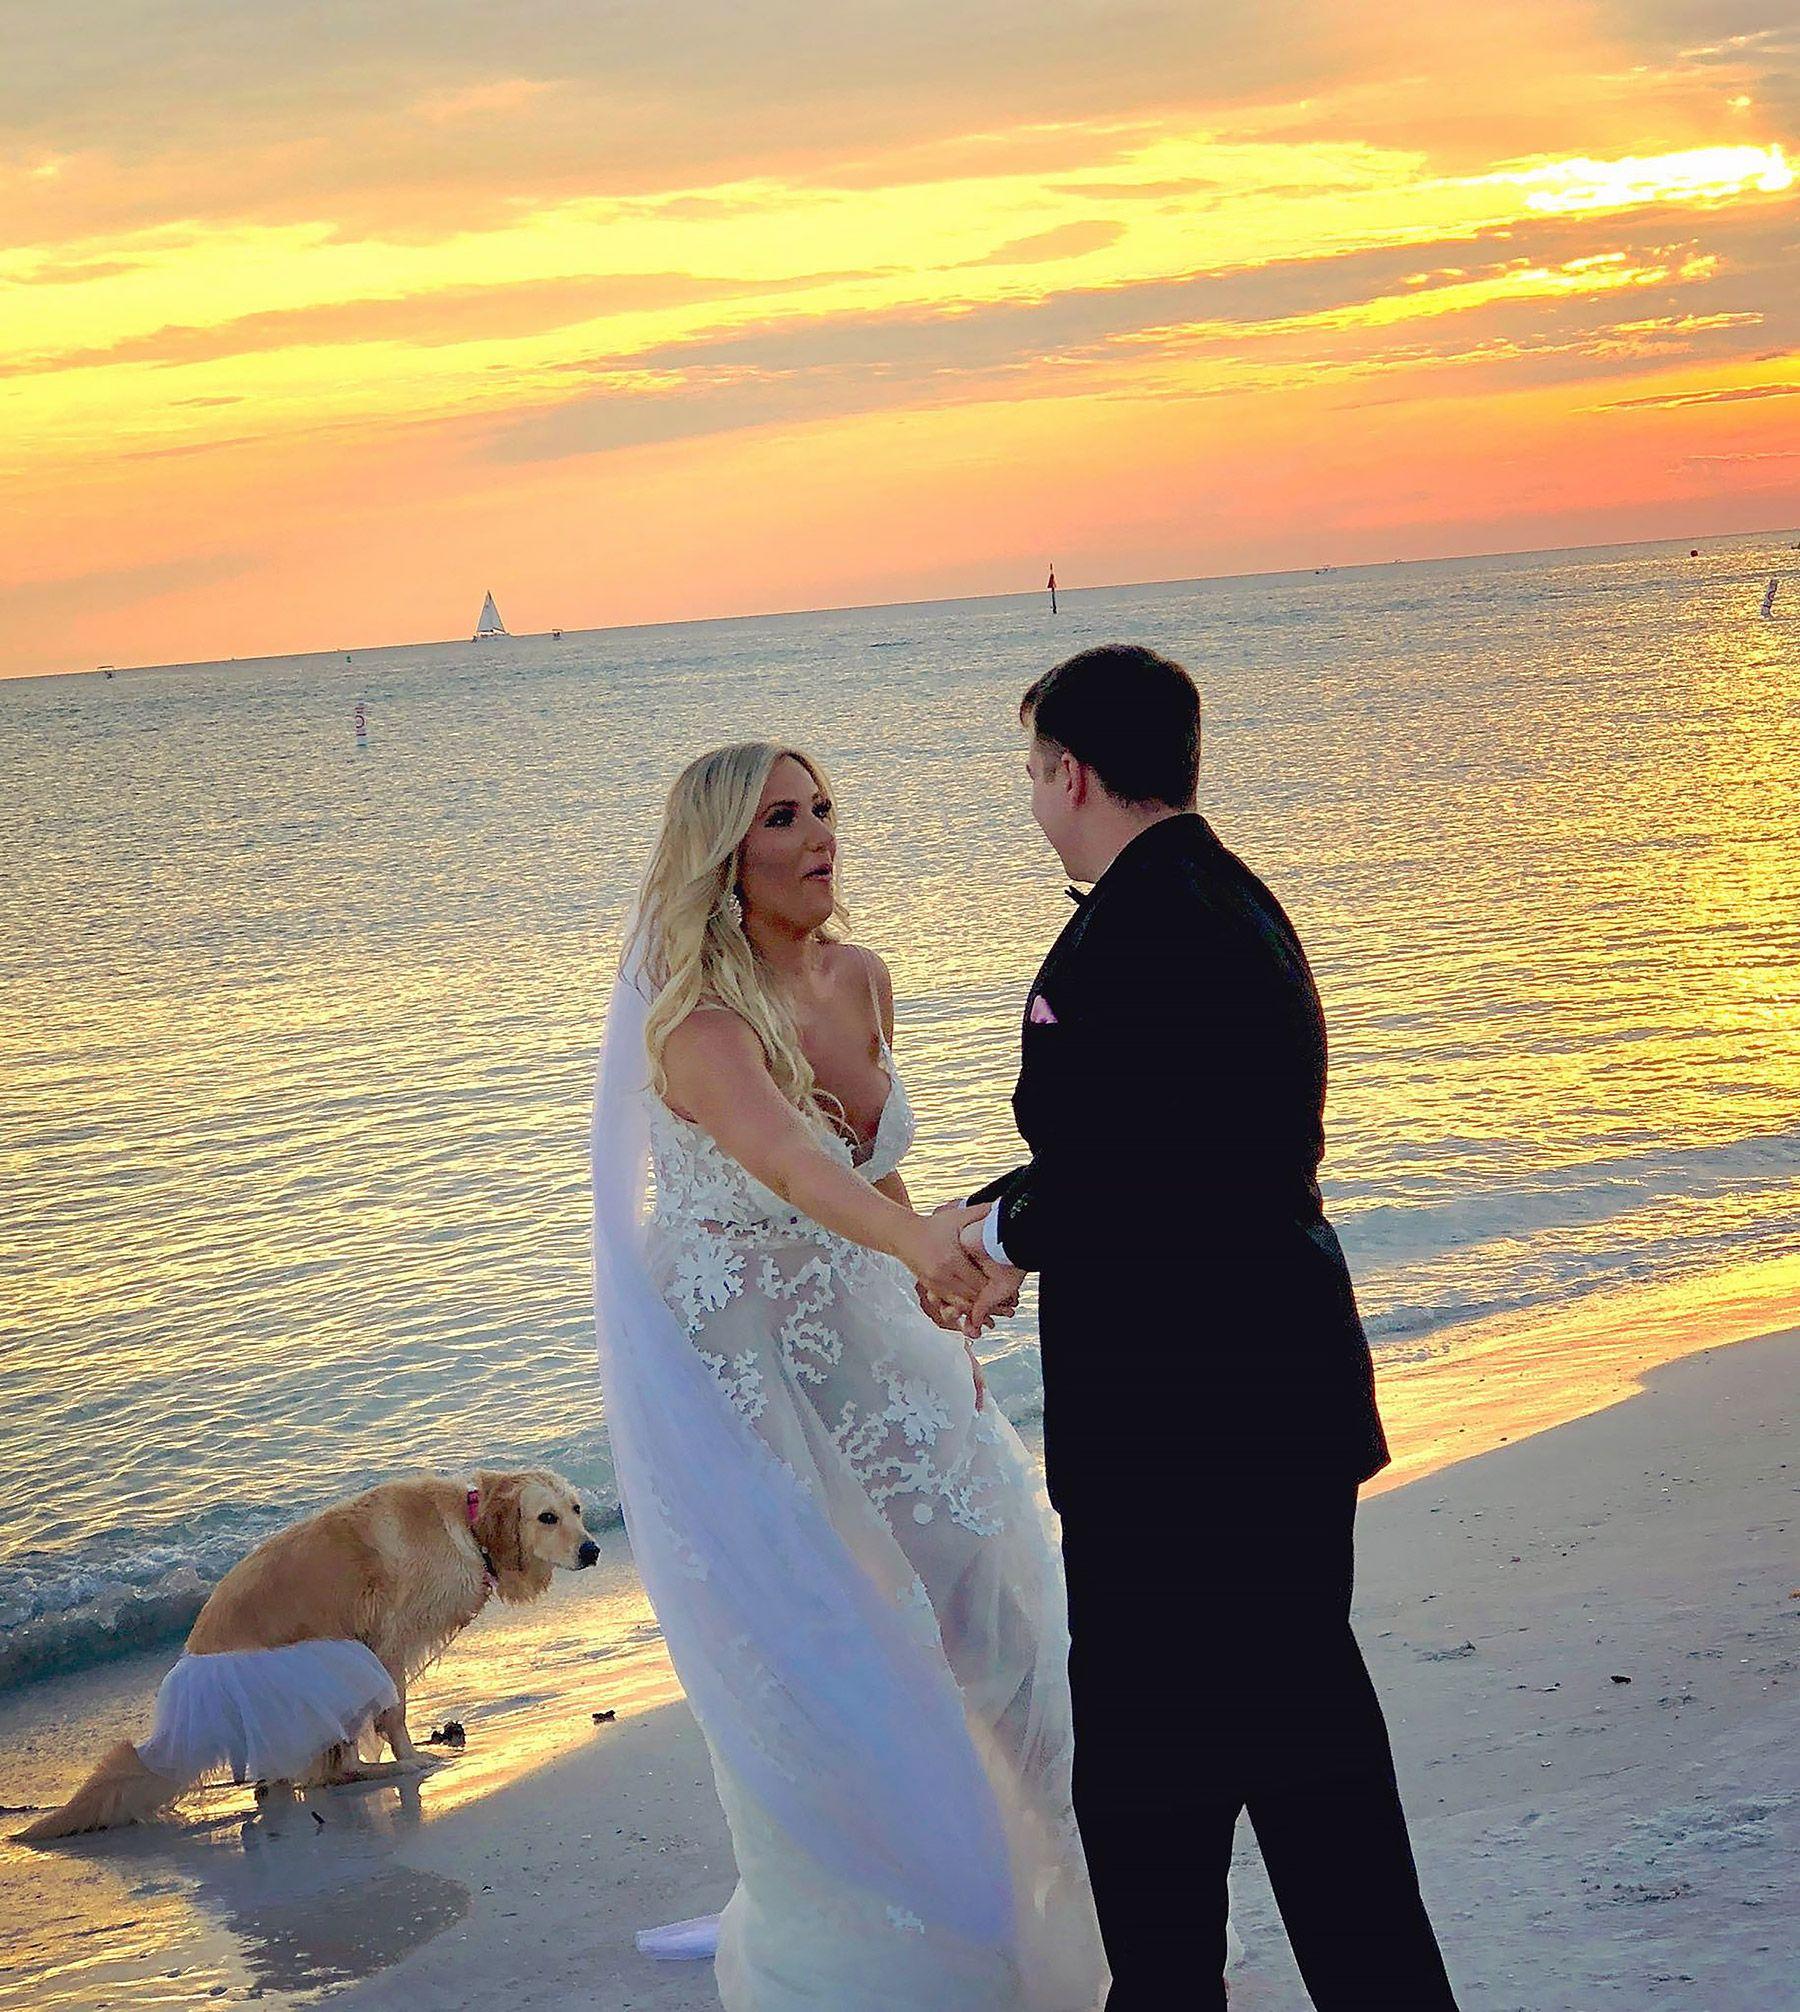 Dog Bridesmaid Interrupts Newlyweds' First Wedding Dance